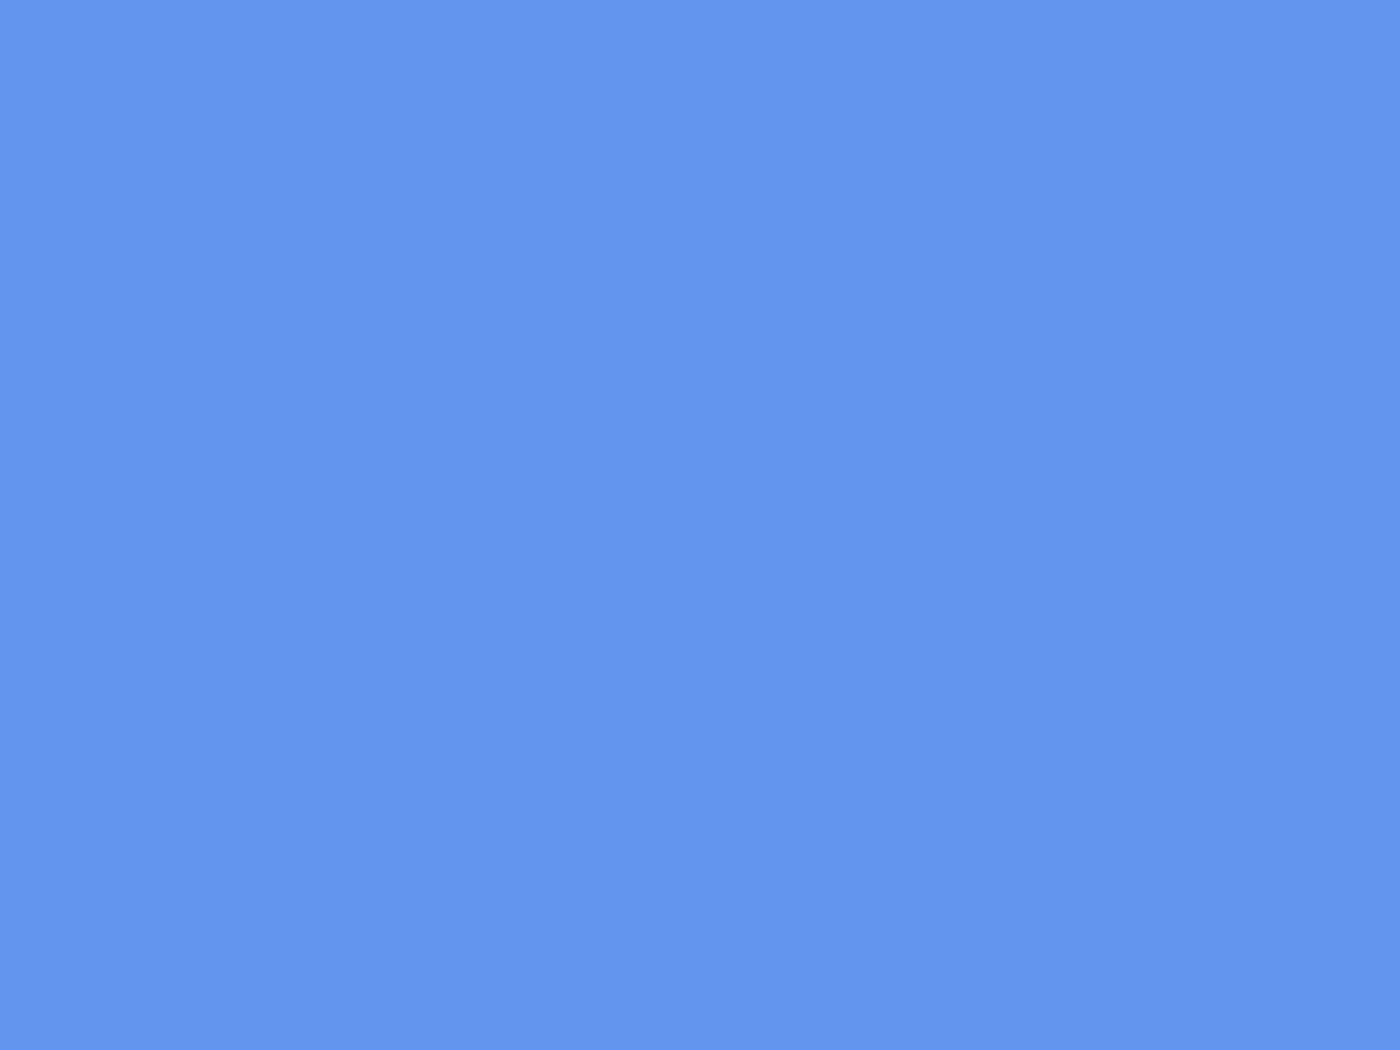 1400x1050 Cornflower Blue Solid Color Background